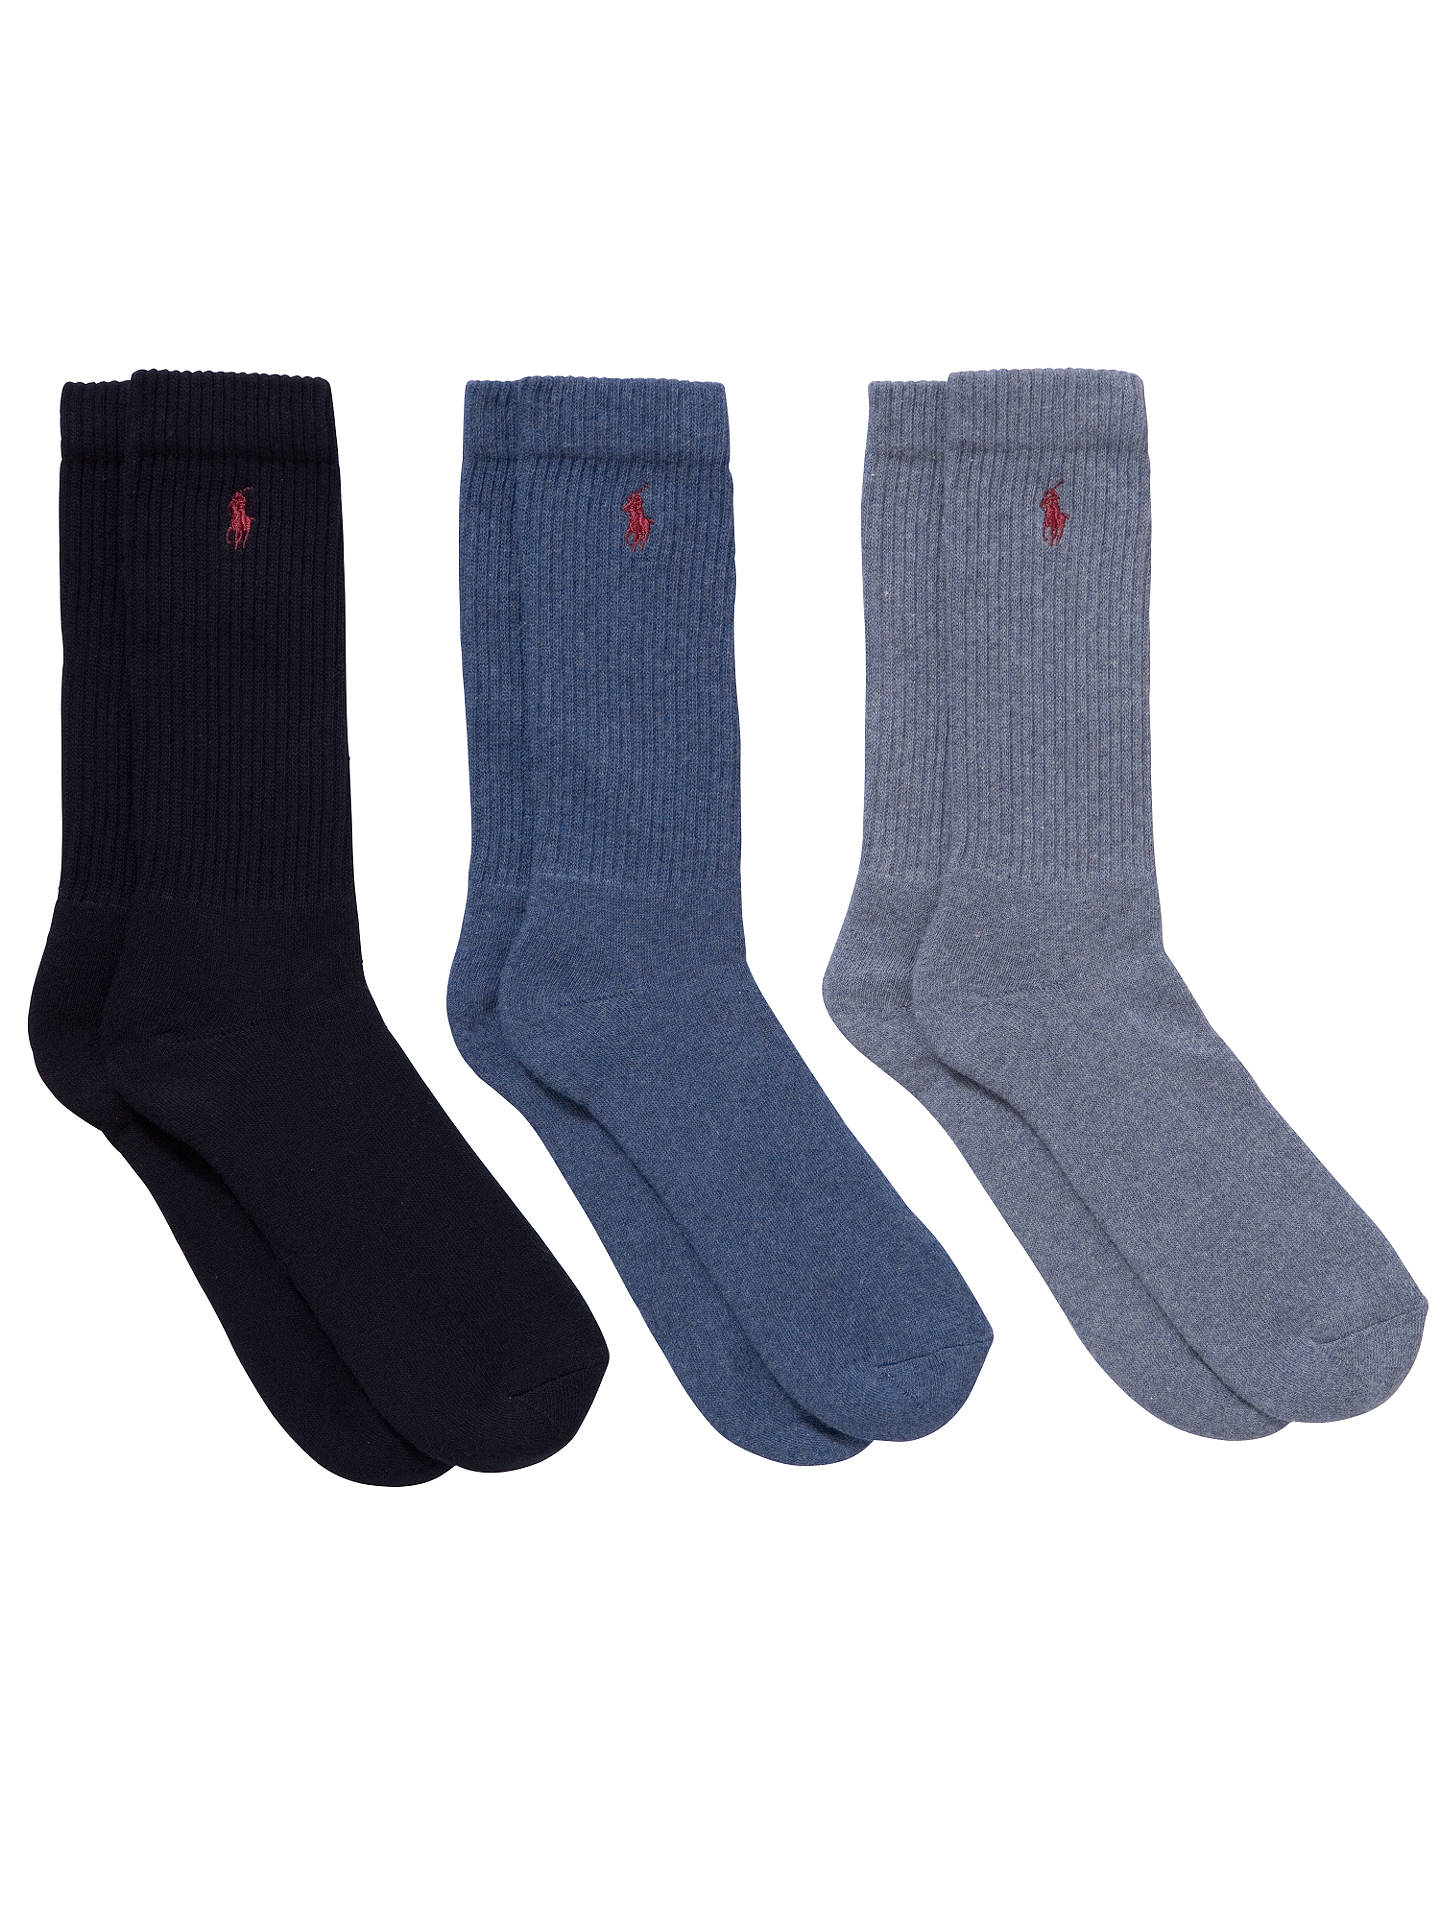 8f97f3982a7 Buy Polo Ralph Lauren Classic Crew Socks